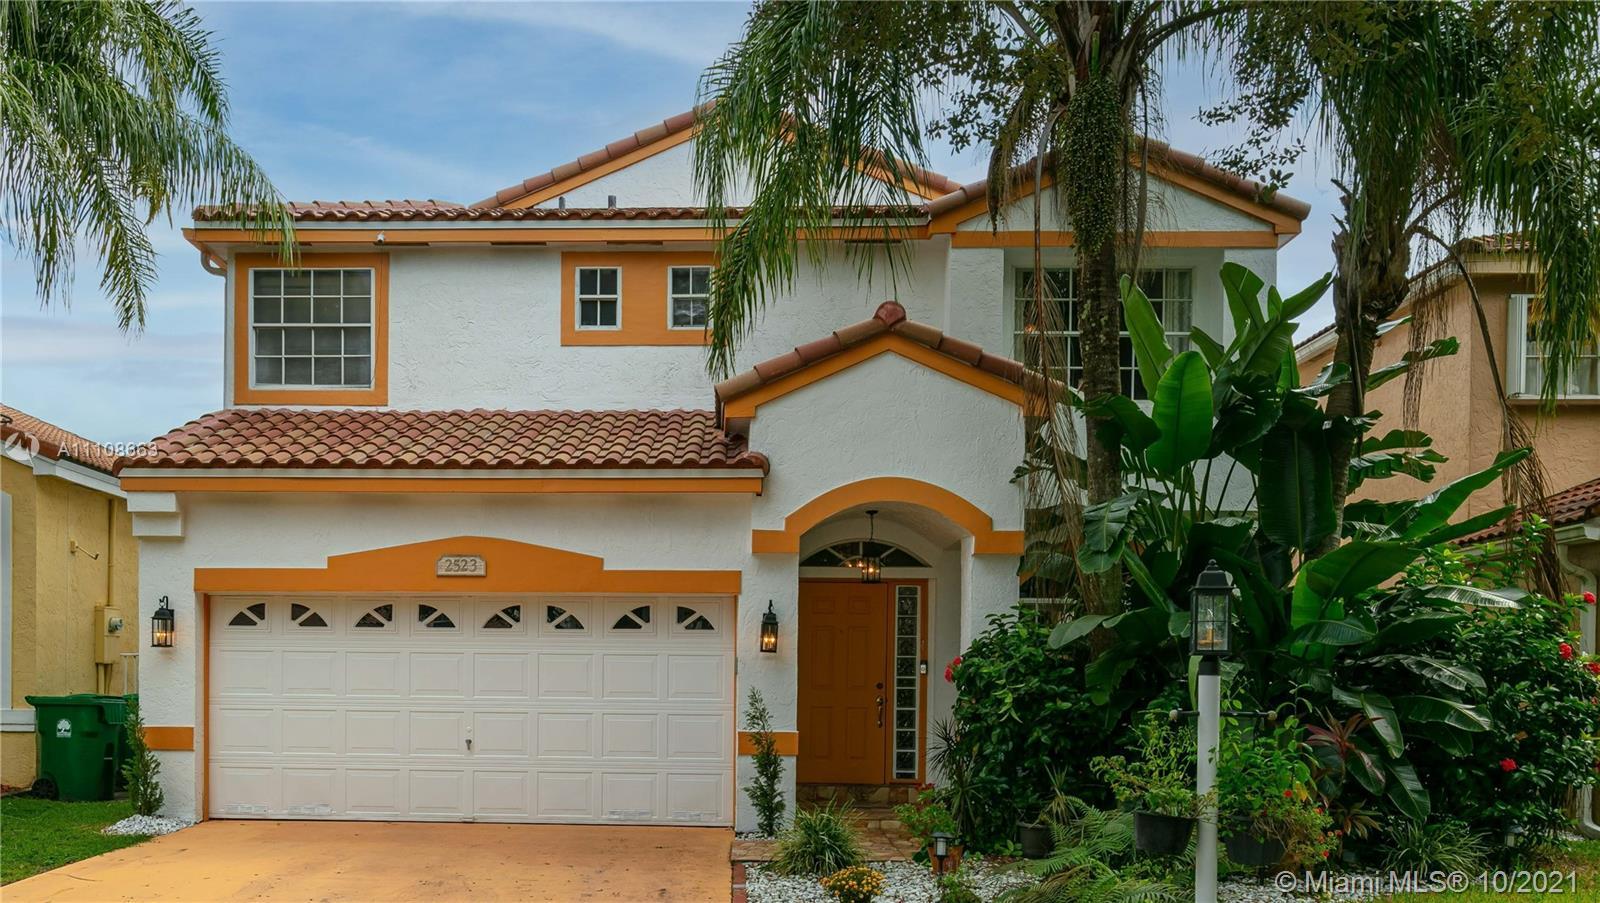 2523 Ambassador Ave, Cooper City, Florida 33026